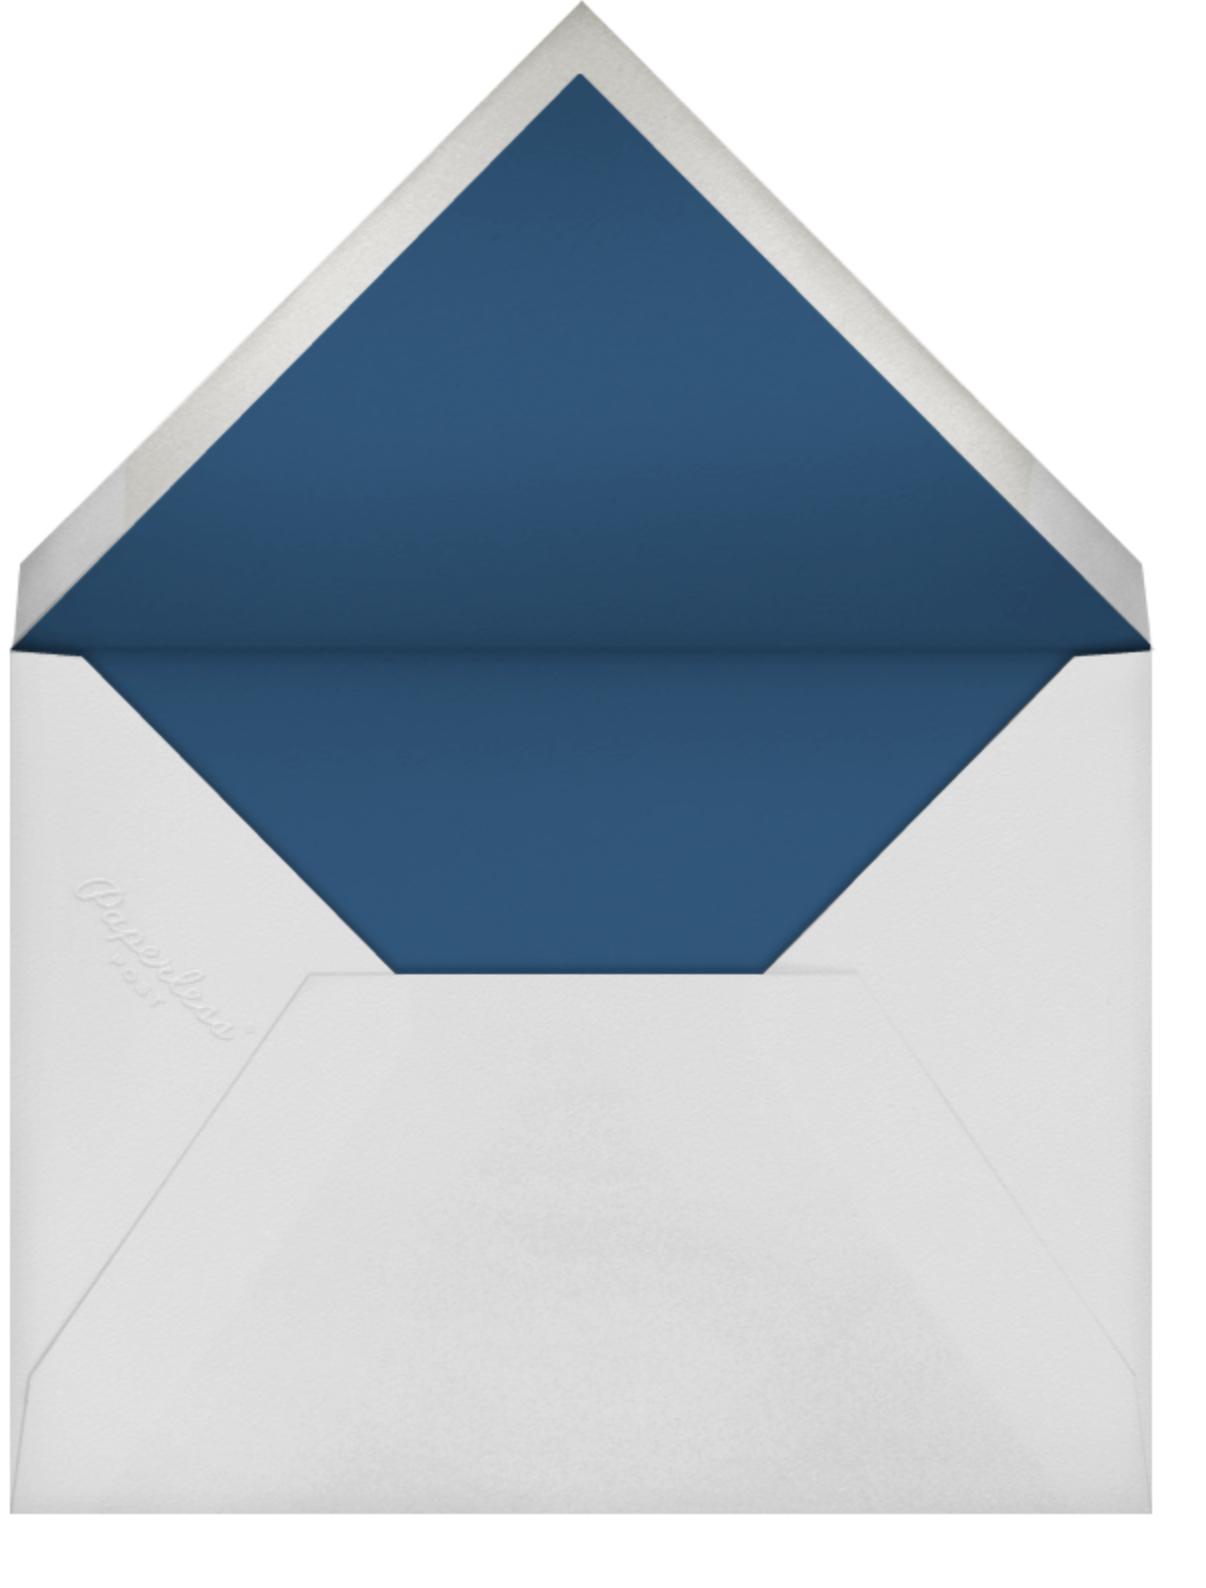 Jemma Street (Invitation) - Gray - kate spade new york - Envelope